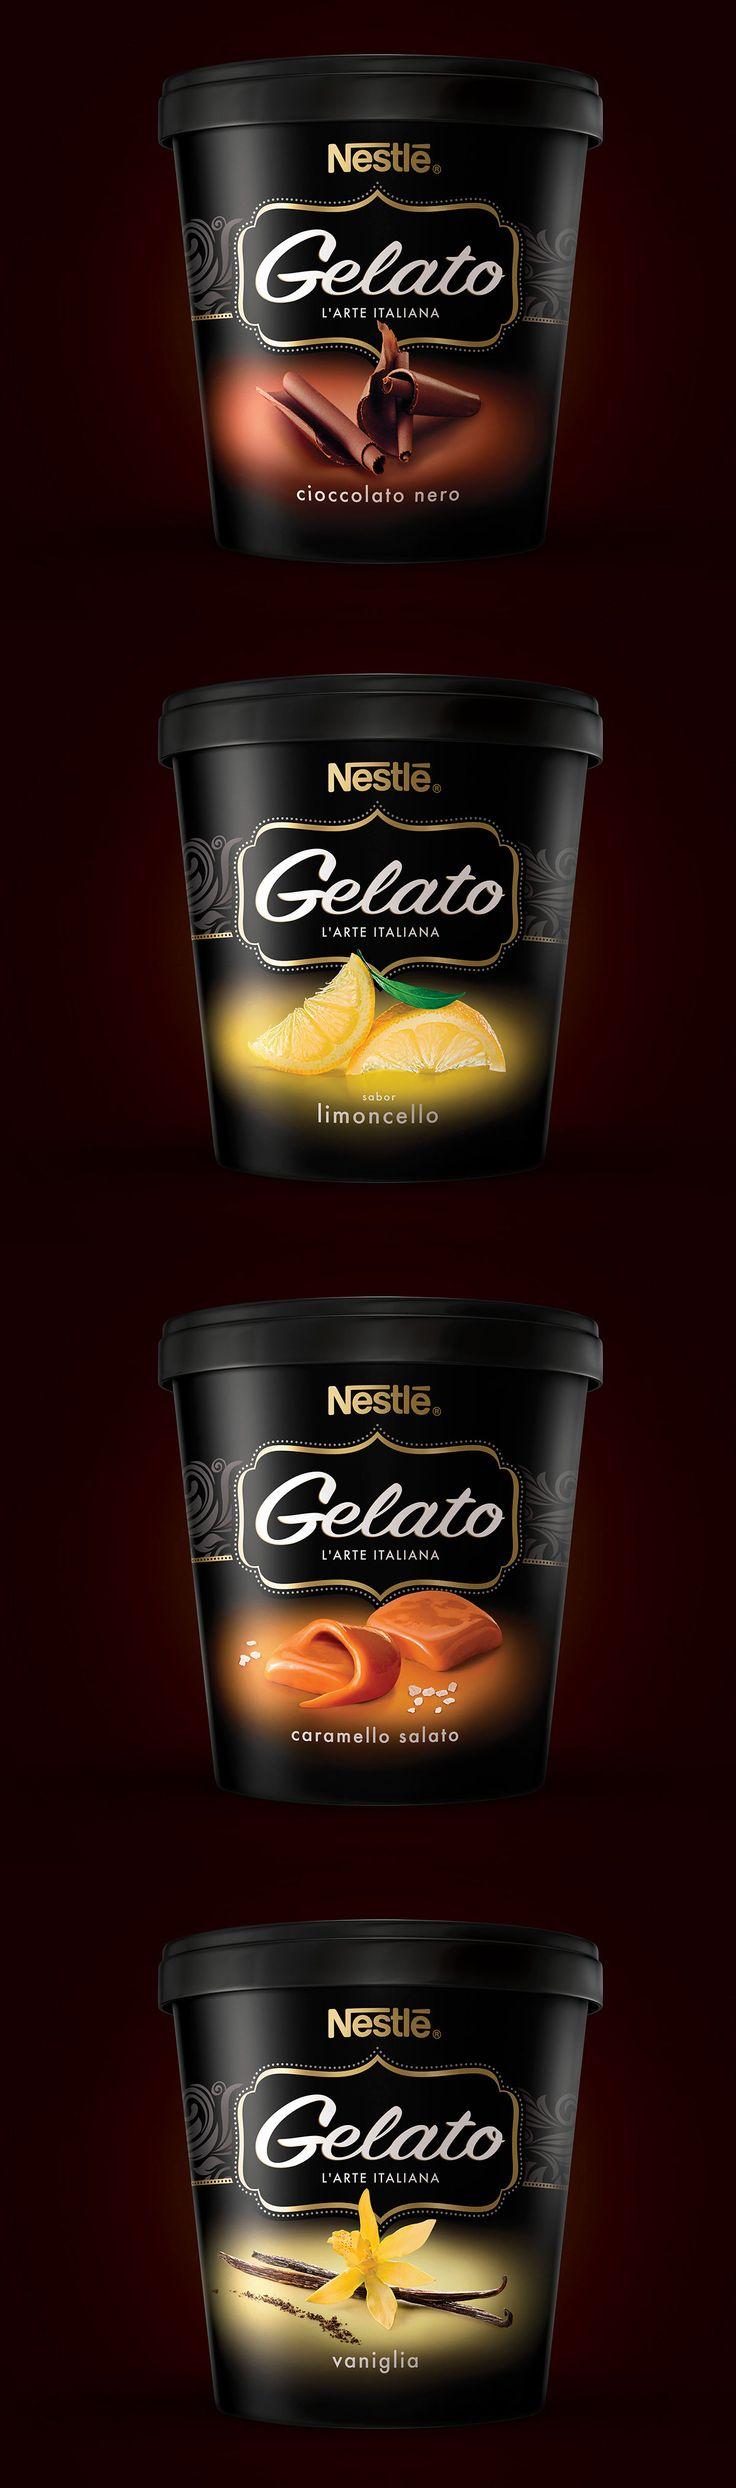 Nestlé Gelato-L'arte Italiana